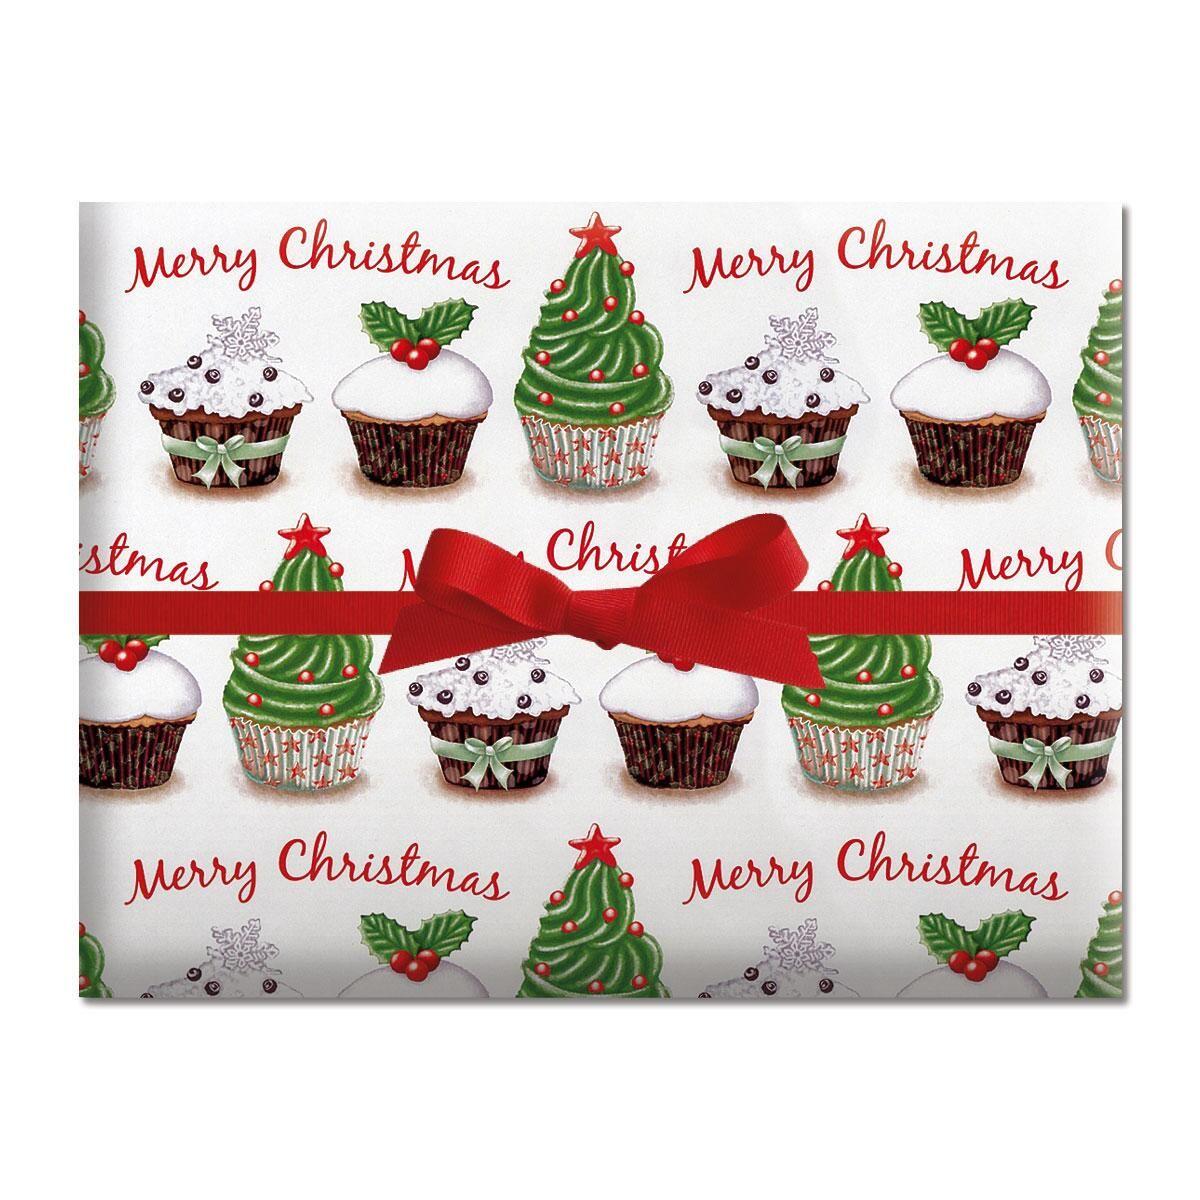 Christmas Cupcake Jumbo Rolled Gift Wrap